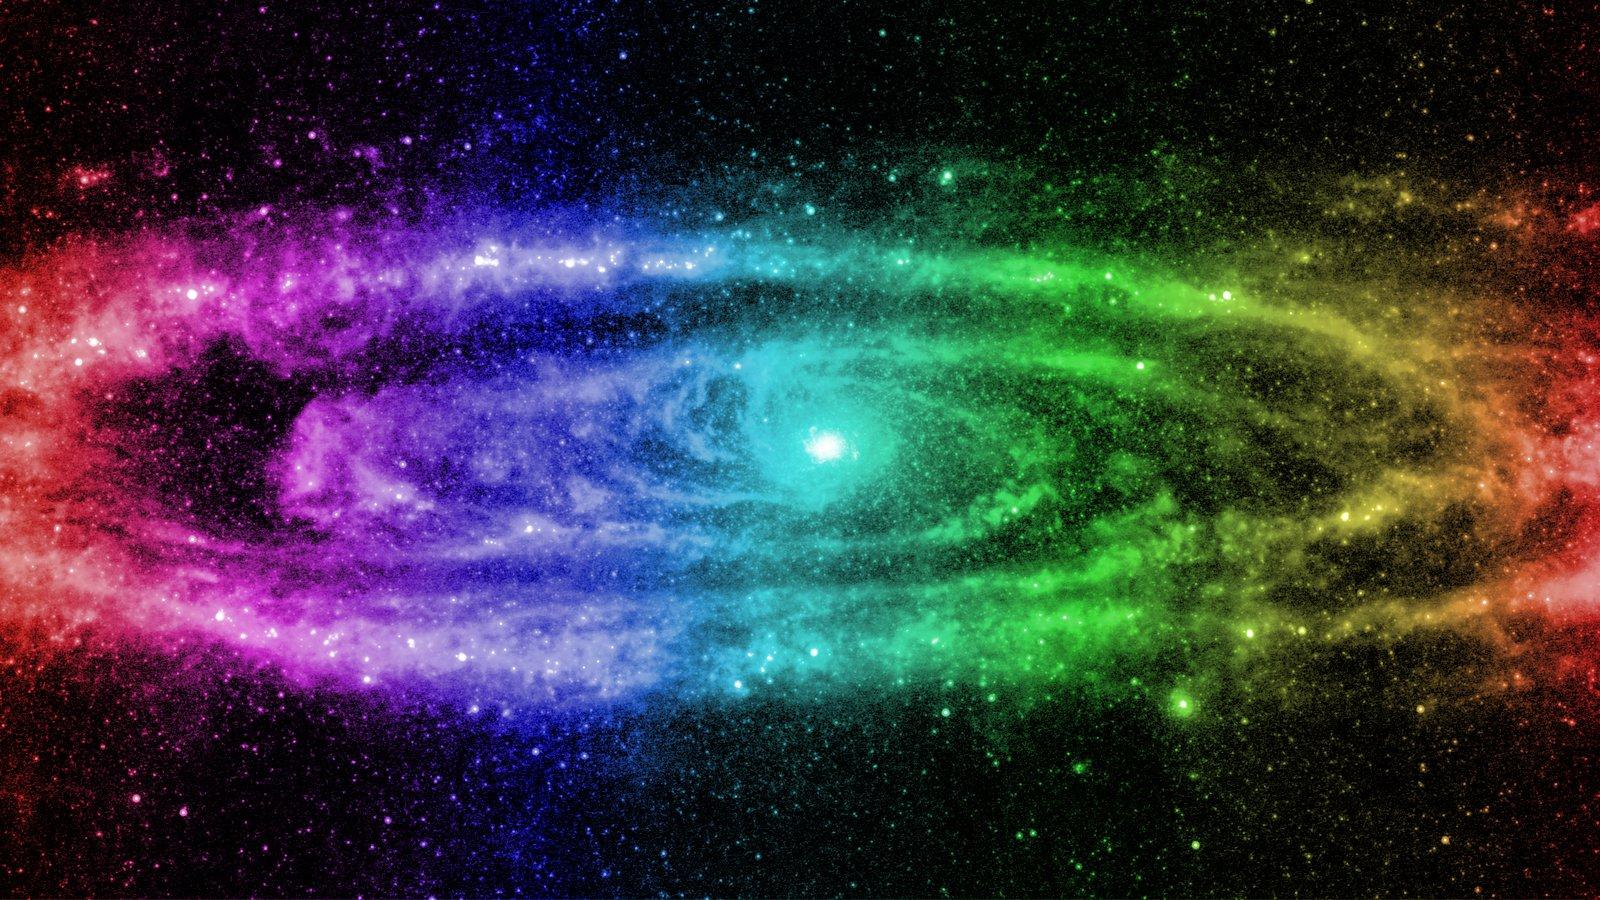 Cool outer space wallpaper wallpapersafari - Space wallpaper 1600x900 ...